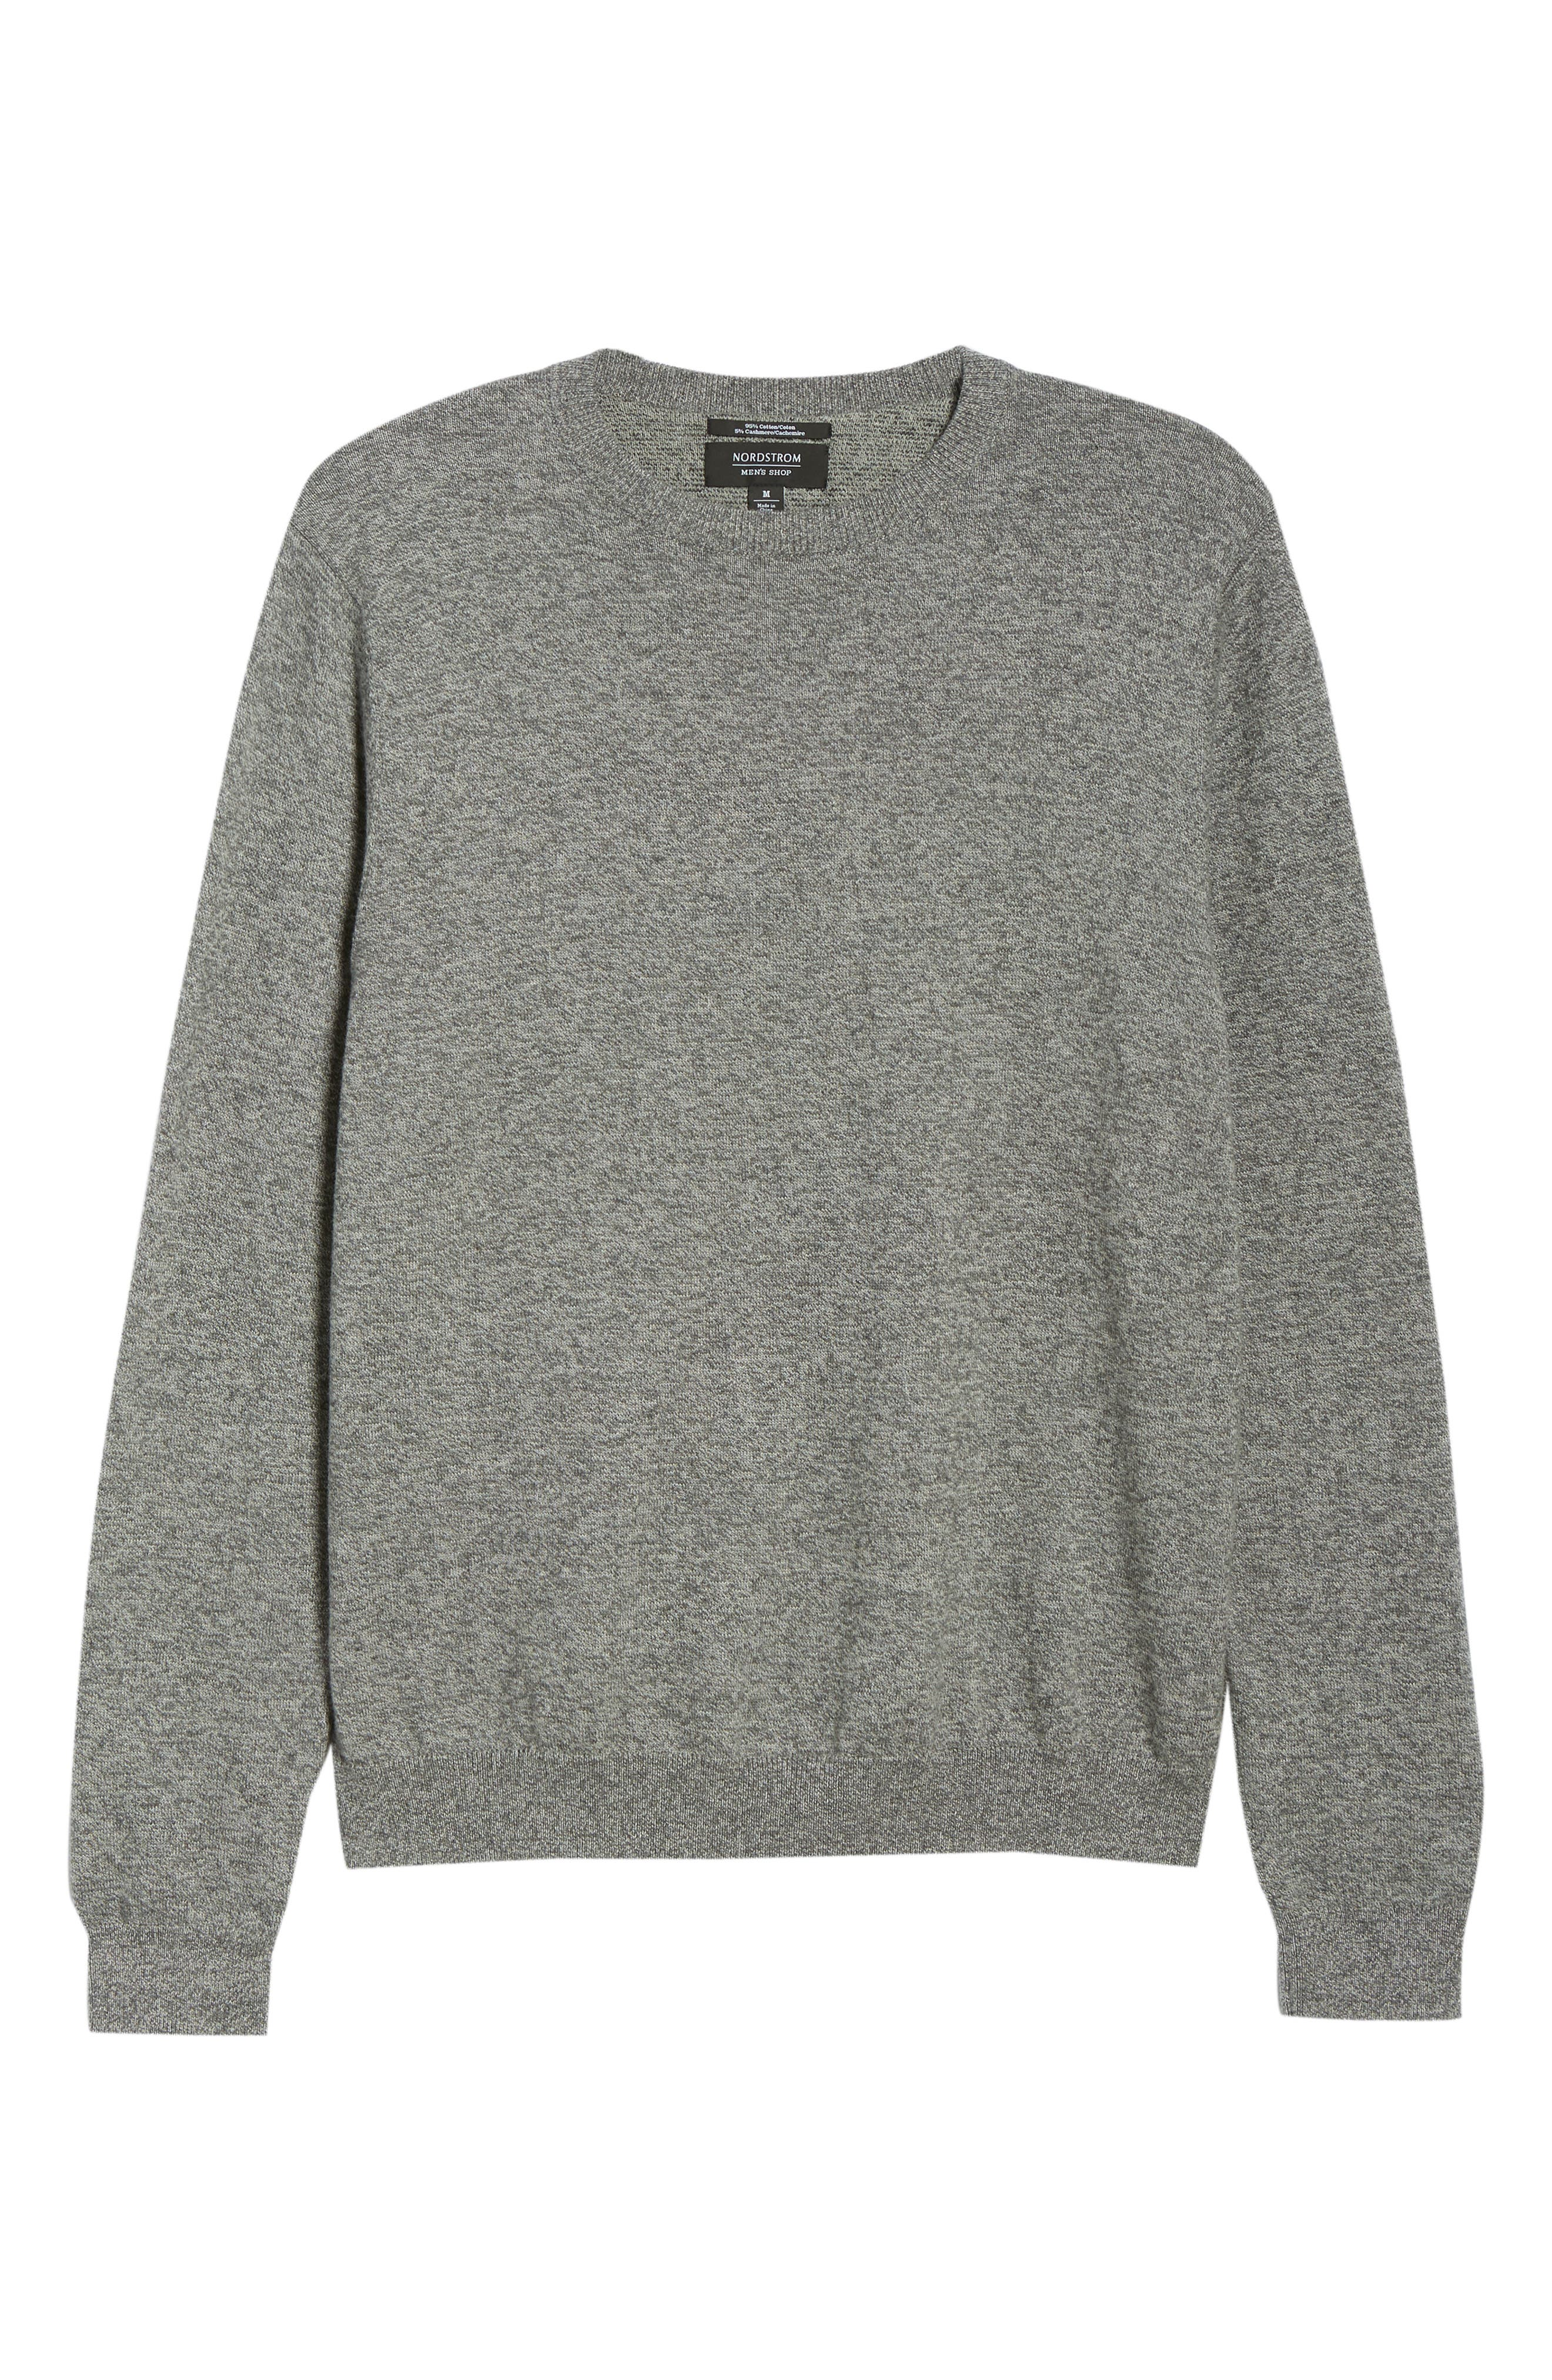 NORDSTROM MEN'S SHOP, Cotton & Cashmere Crewneck Sweater, Alternate thumbnail 6, color, GREY SHADE MARL